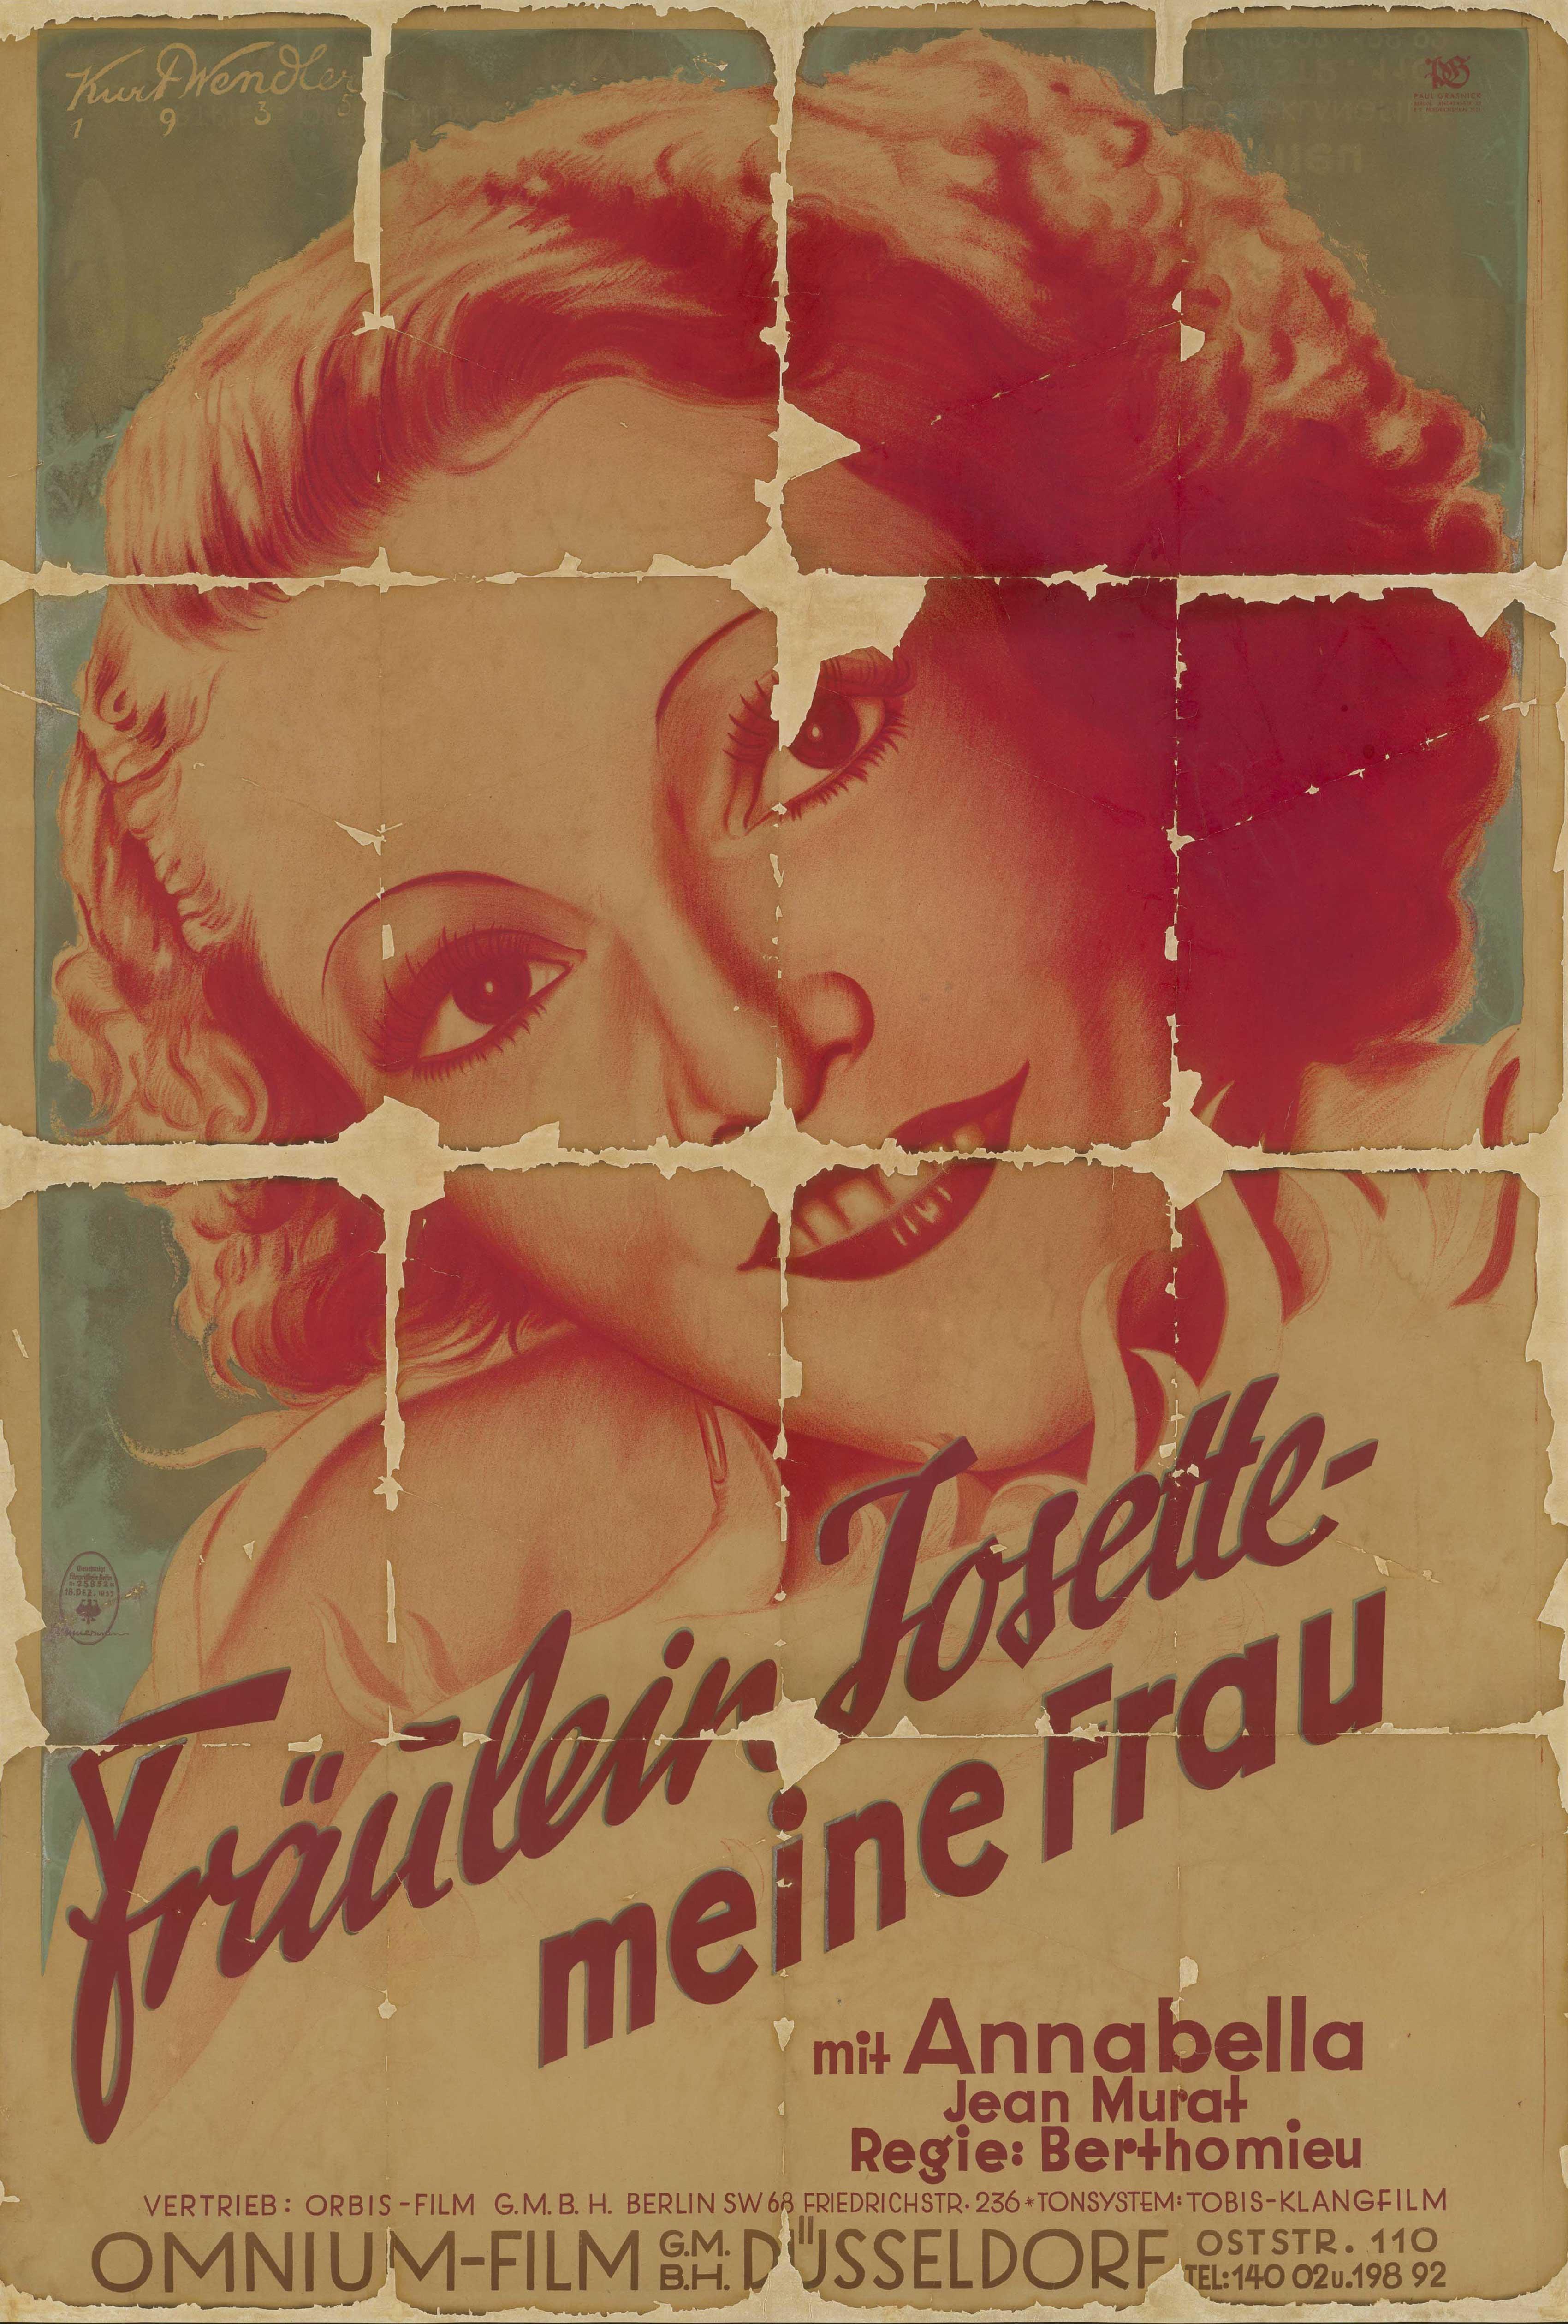 Filmplakat zu dem Film Mademoiselle Josette, ma femme, Frankreich 1933